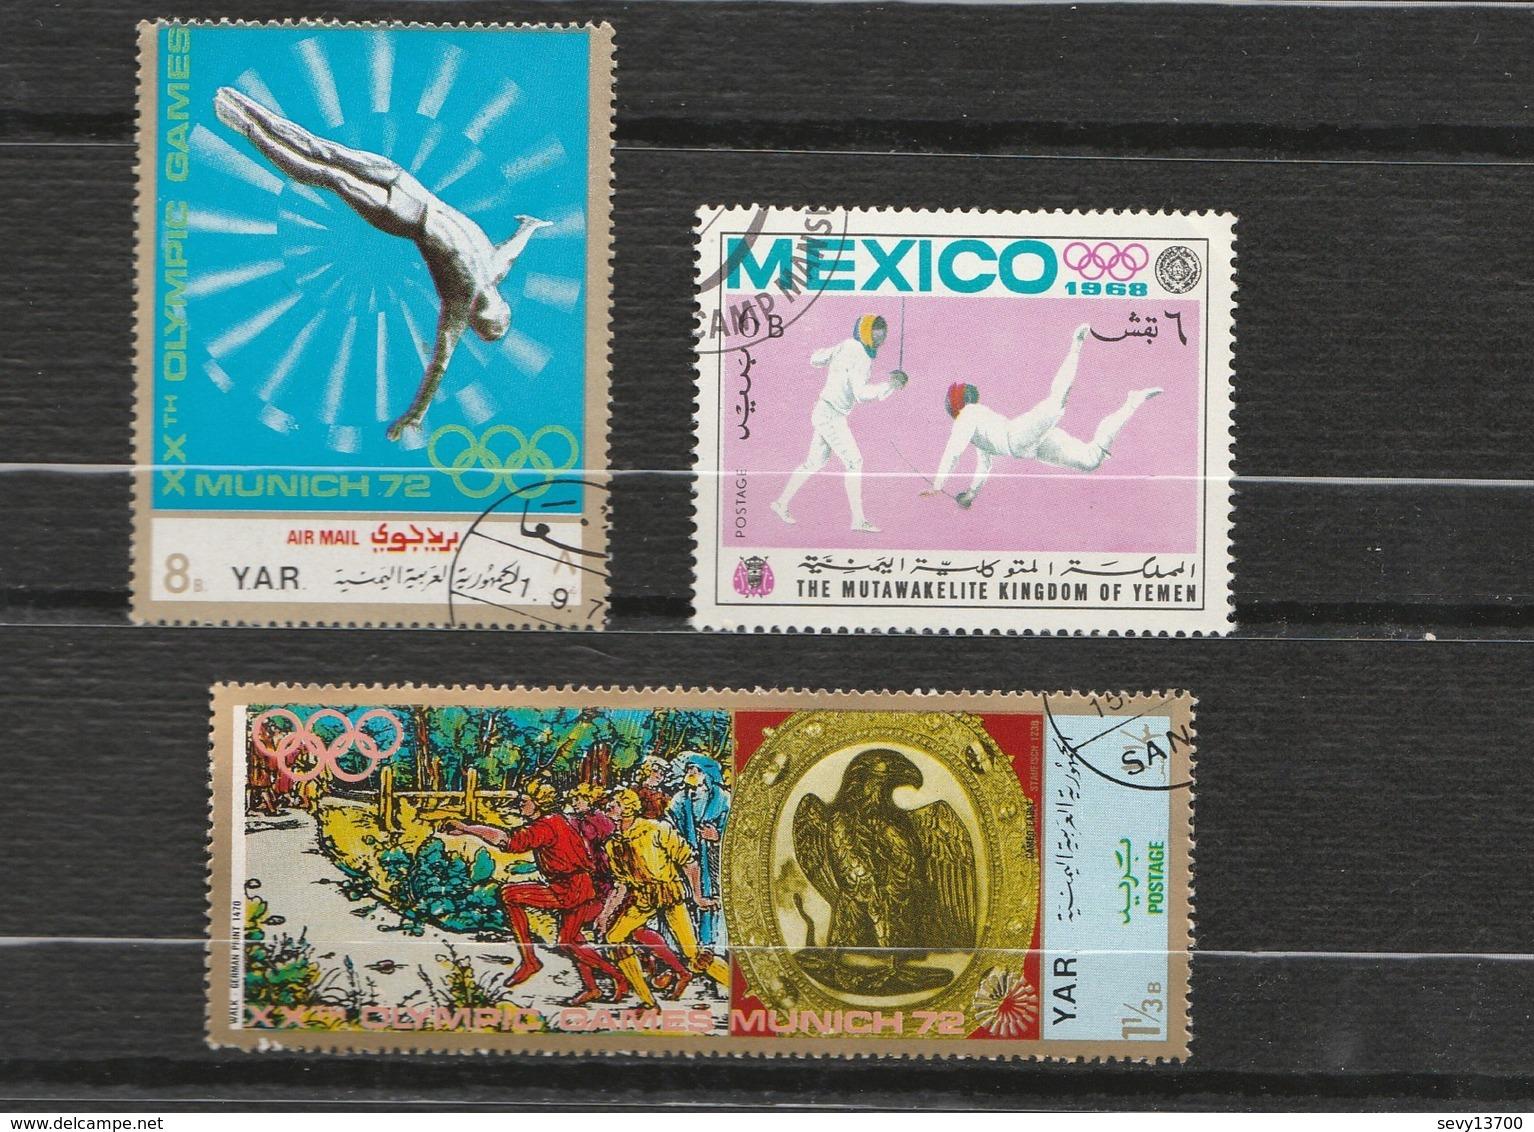 Yemen Lot 7 Timbres Jeux Olympiques Grenoble 1968 Mi YE AR 761 à 764 - Munich Mi YE-AR 1469 YE-AR 1373 Mexico YE-K 497A - Jemen